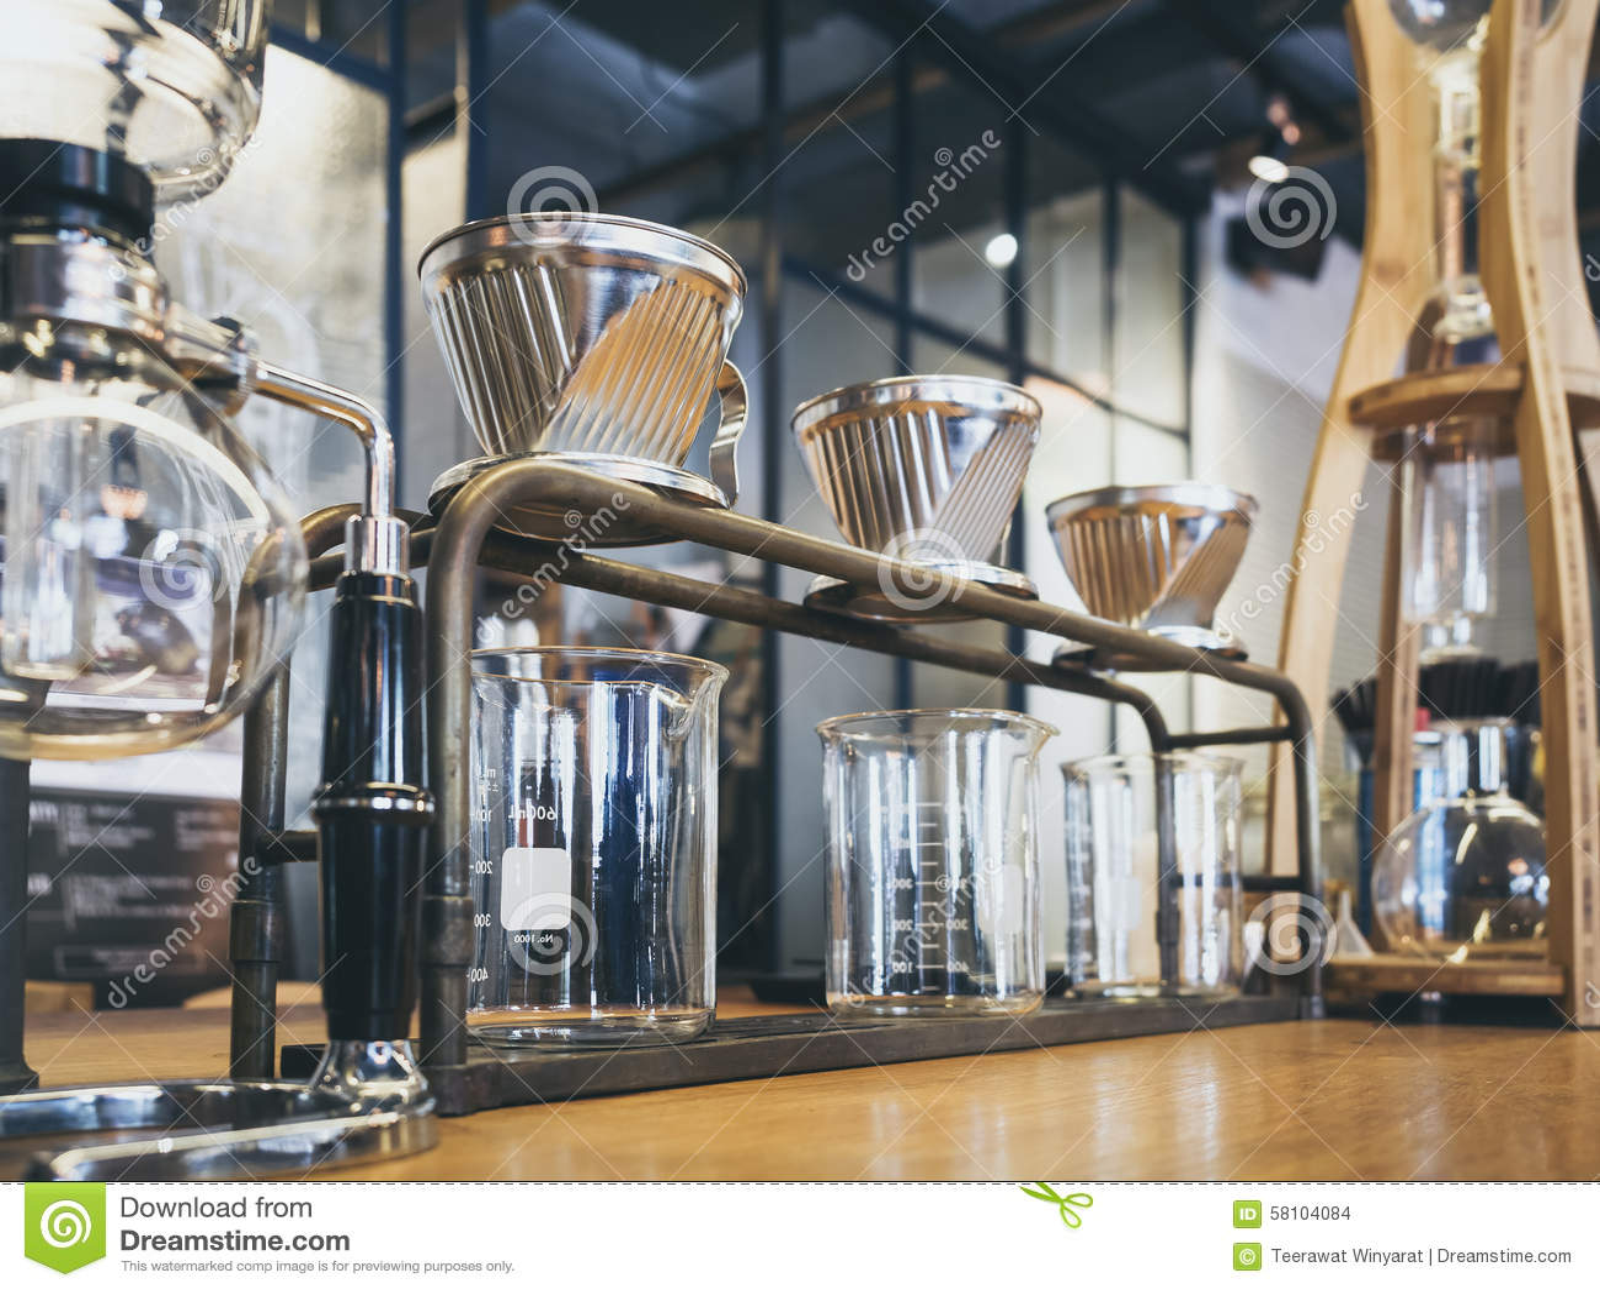 Coffee Table Kits Drip Coffee Glass Kits Coffee Shop Cafe Display Stock Photo